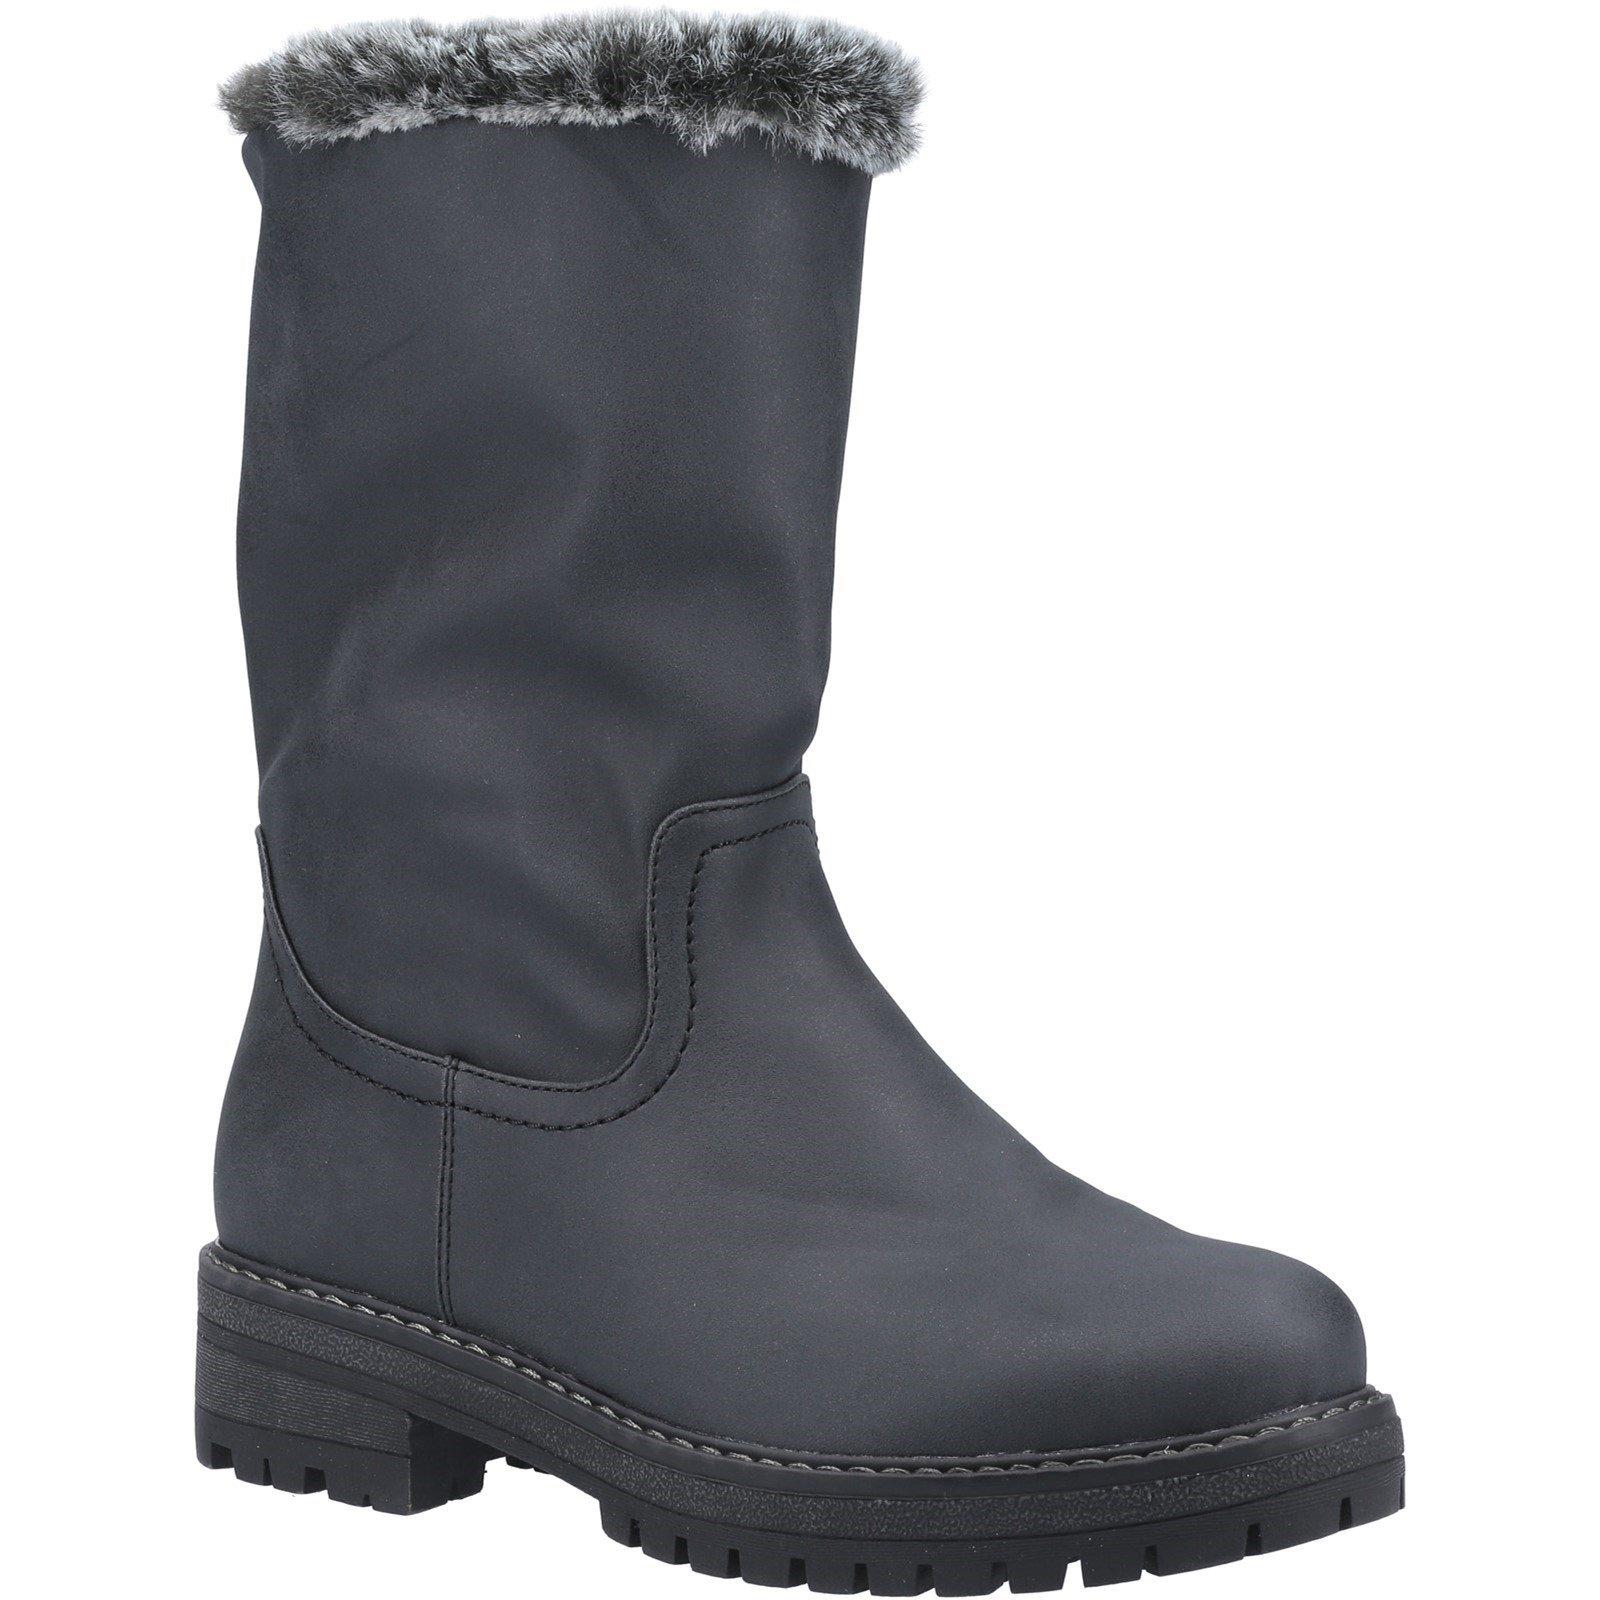 Divaz Women's Nadia Fur Lined Boot Various Colours 33025 - Black 3